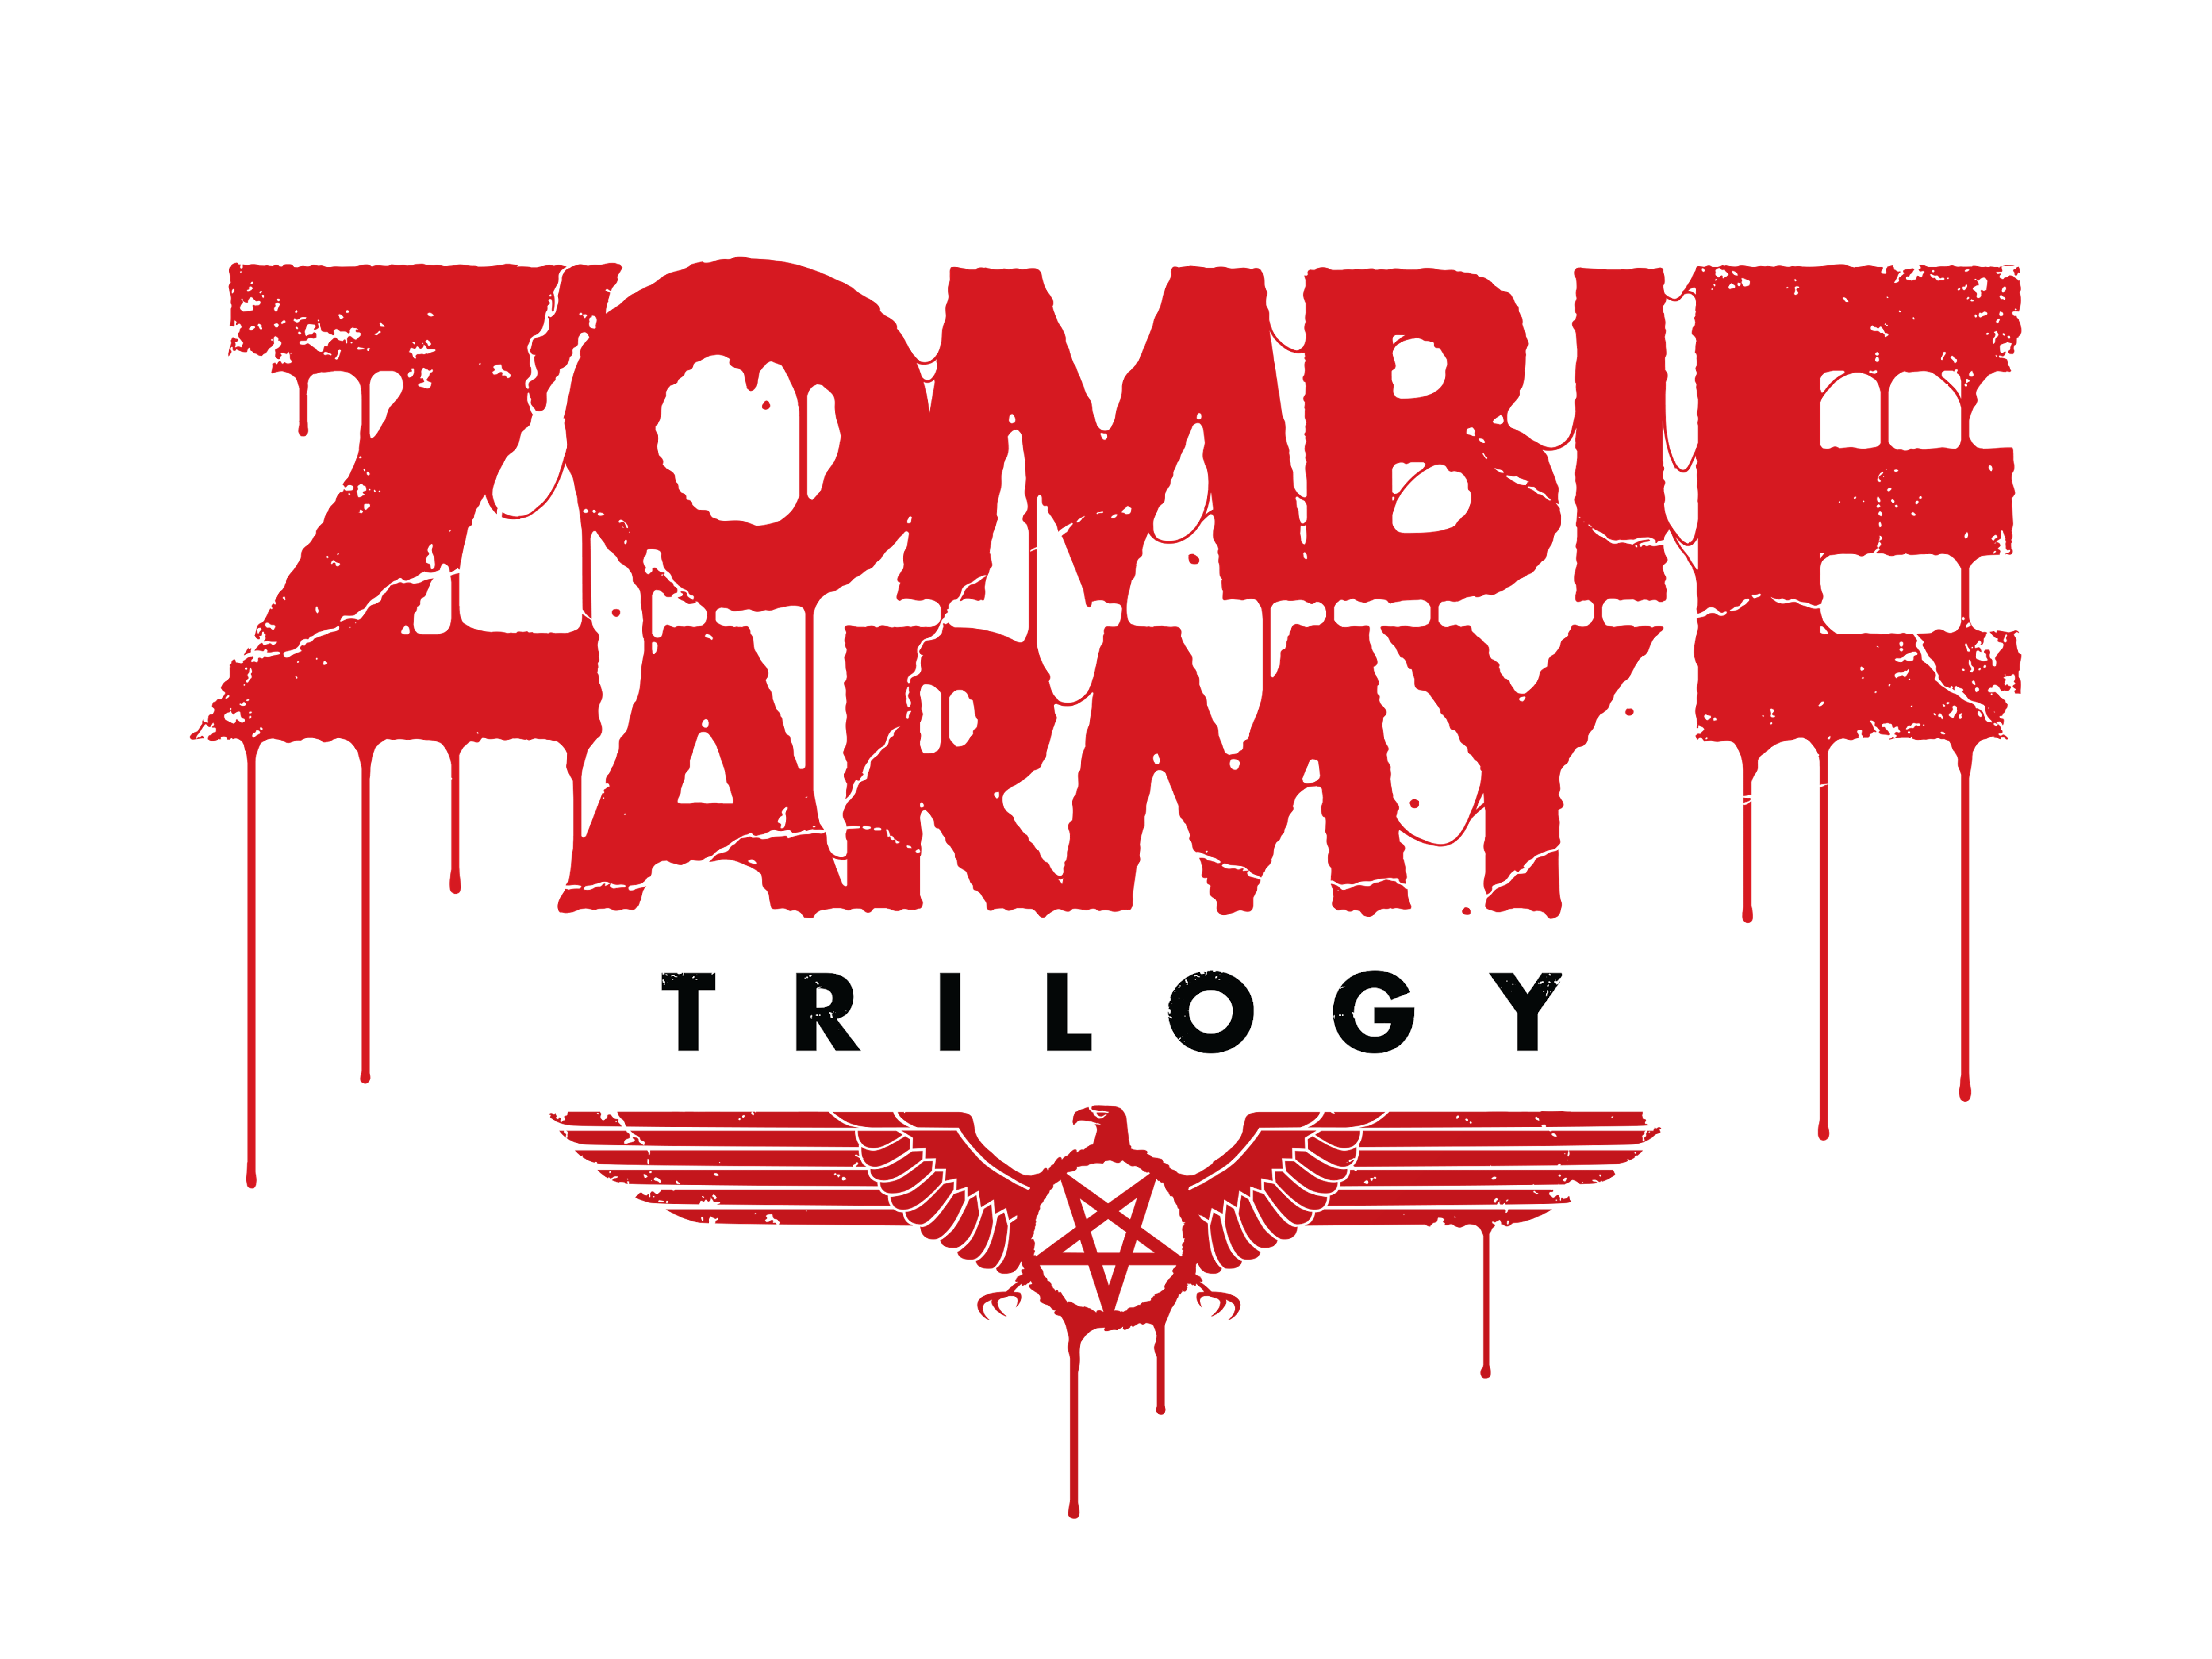 image zombie army trilogy logo png sniper elite wiki fandom rh sniperelitegame wikia com american sniper logos marine sniper logos